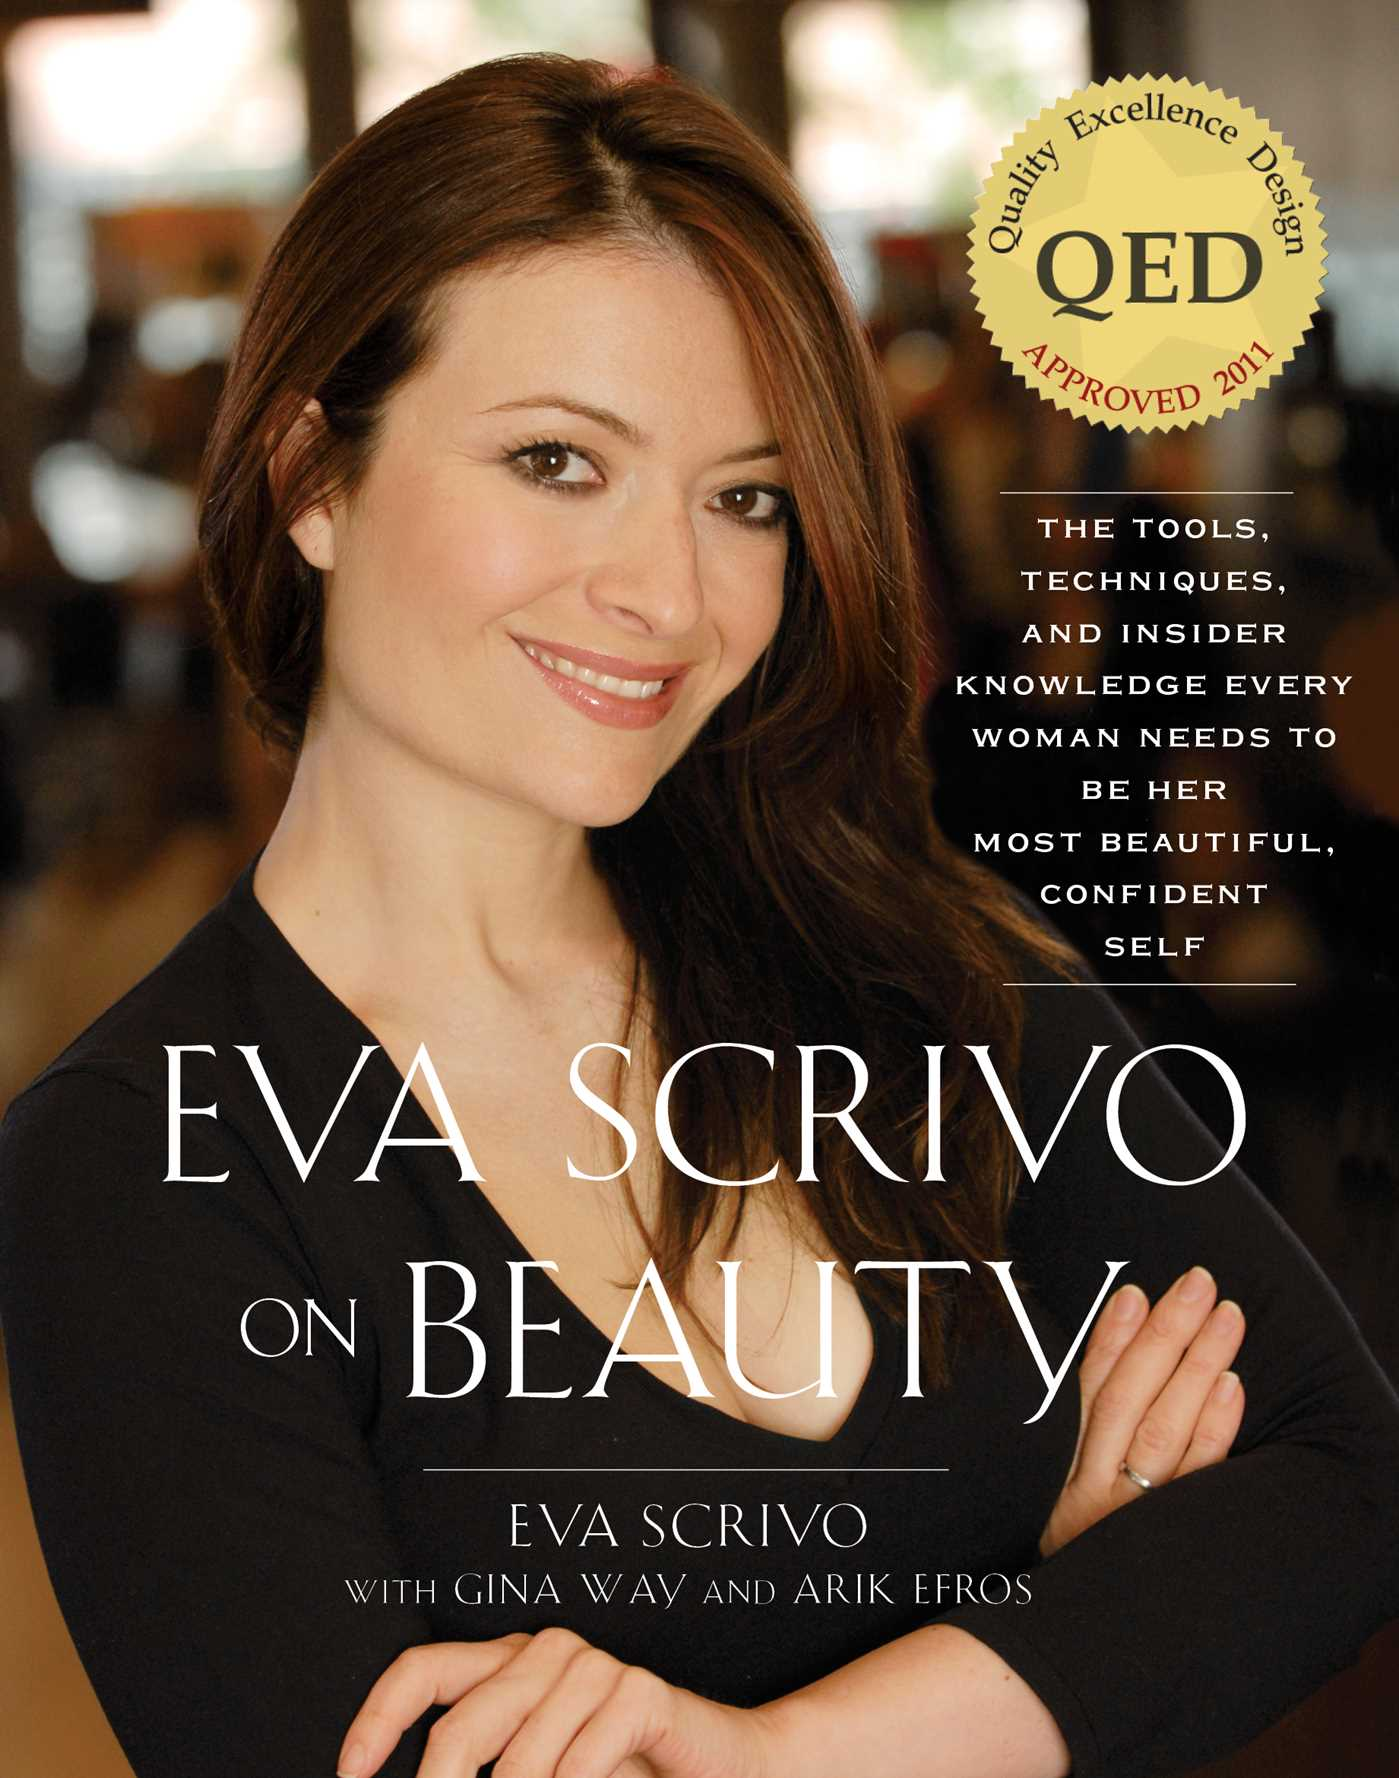 Eva scrivo on beauty (with embedded videos) 9781439164860 hr